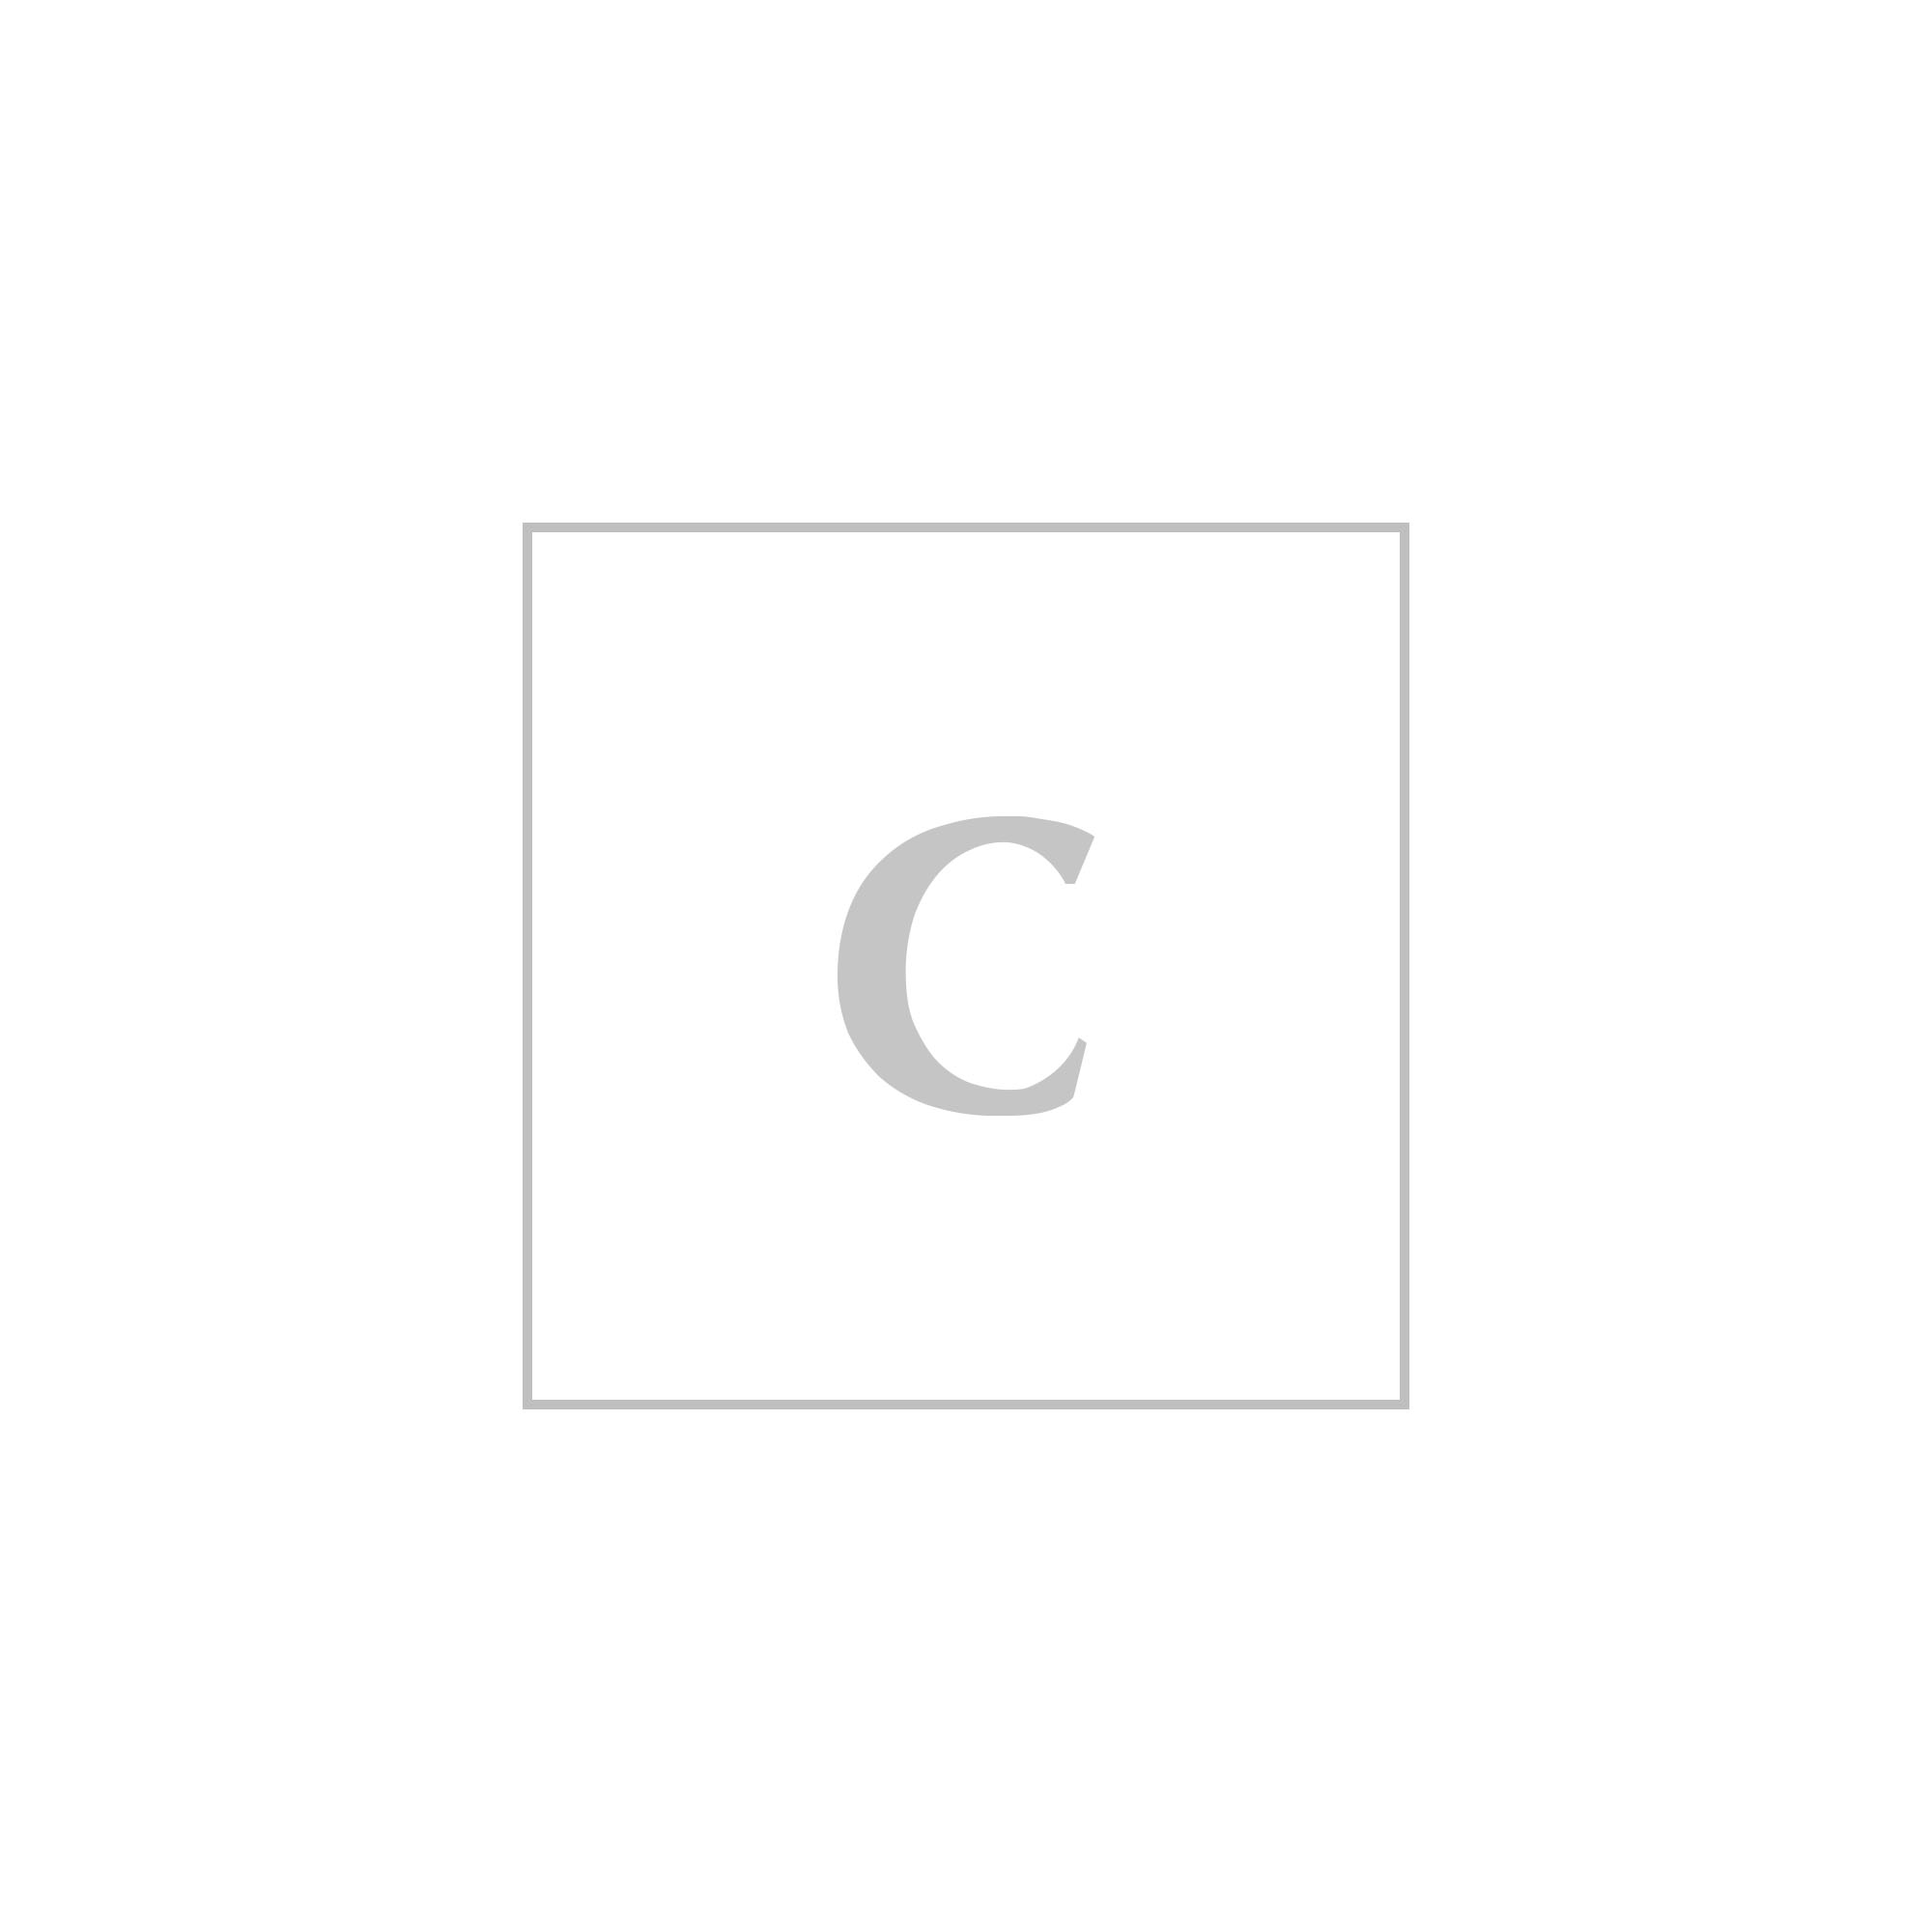 Saint laurent borsa monogram